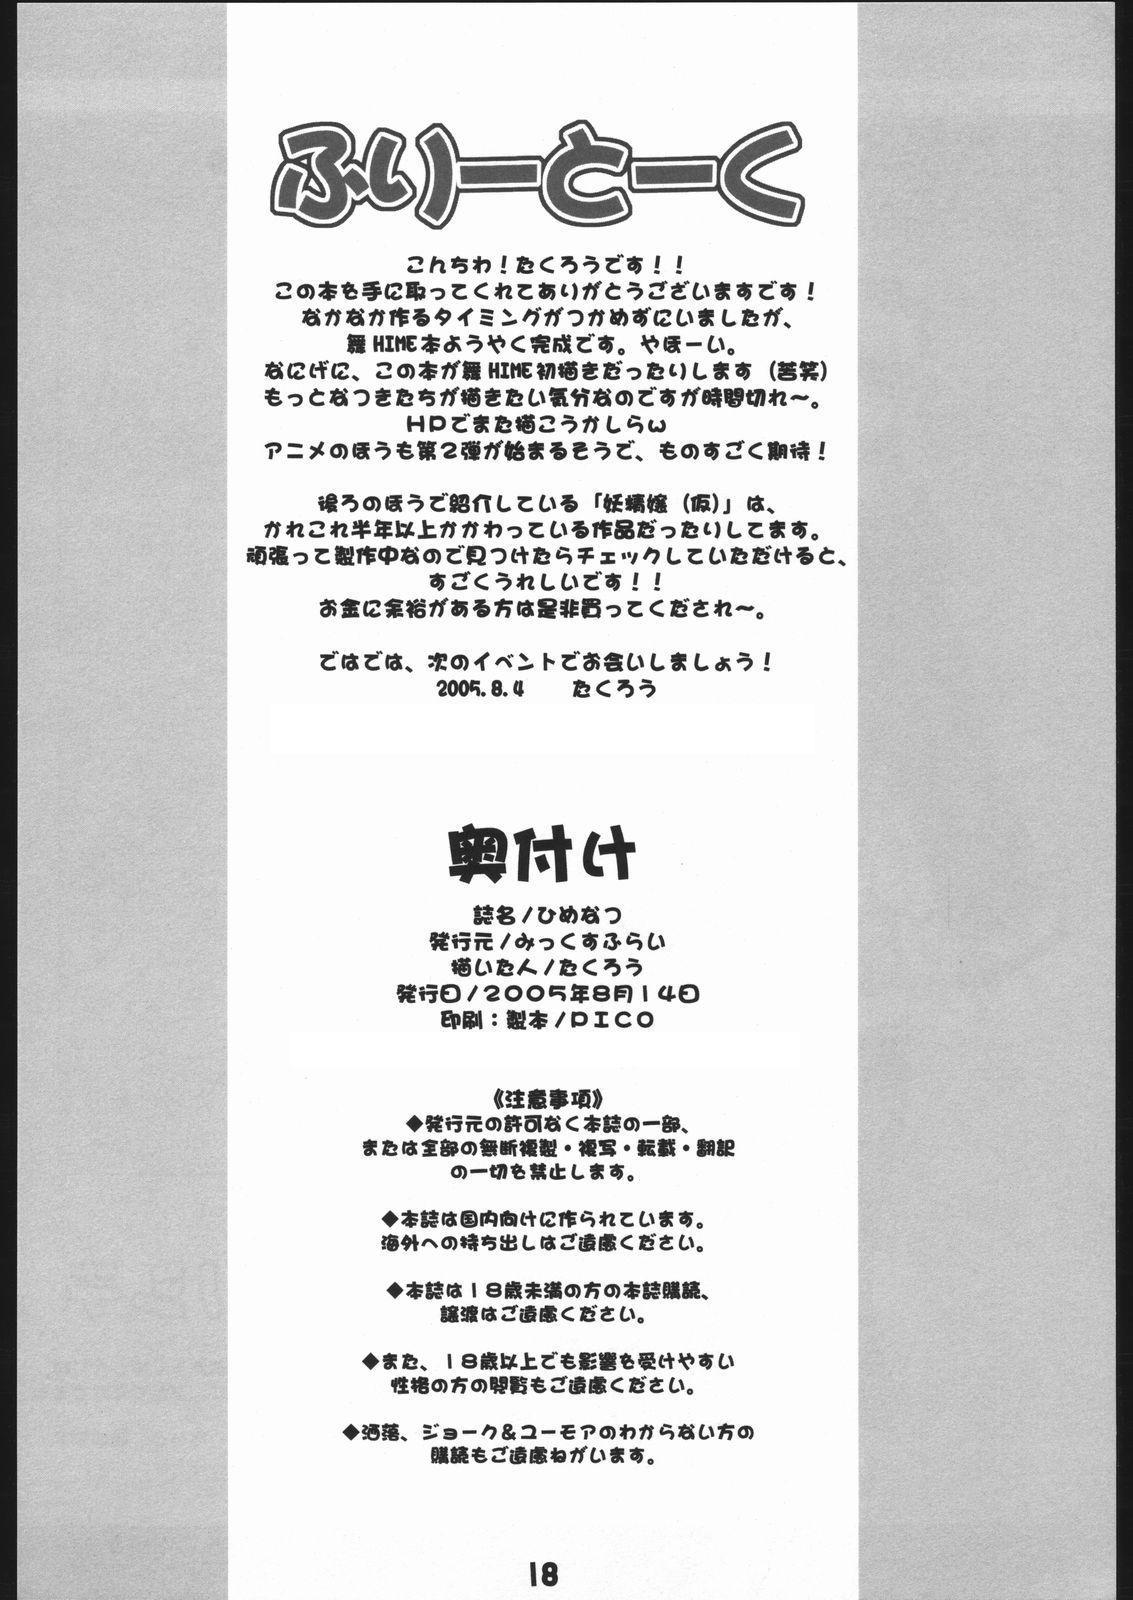 Himenatsu 16